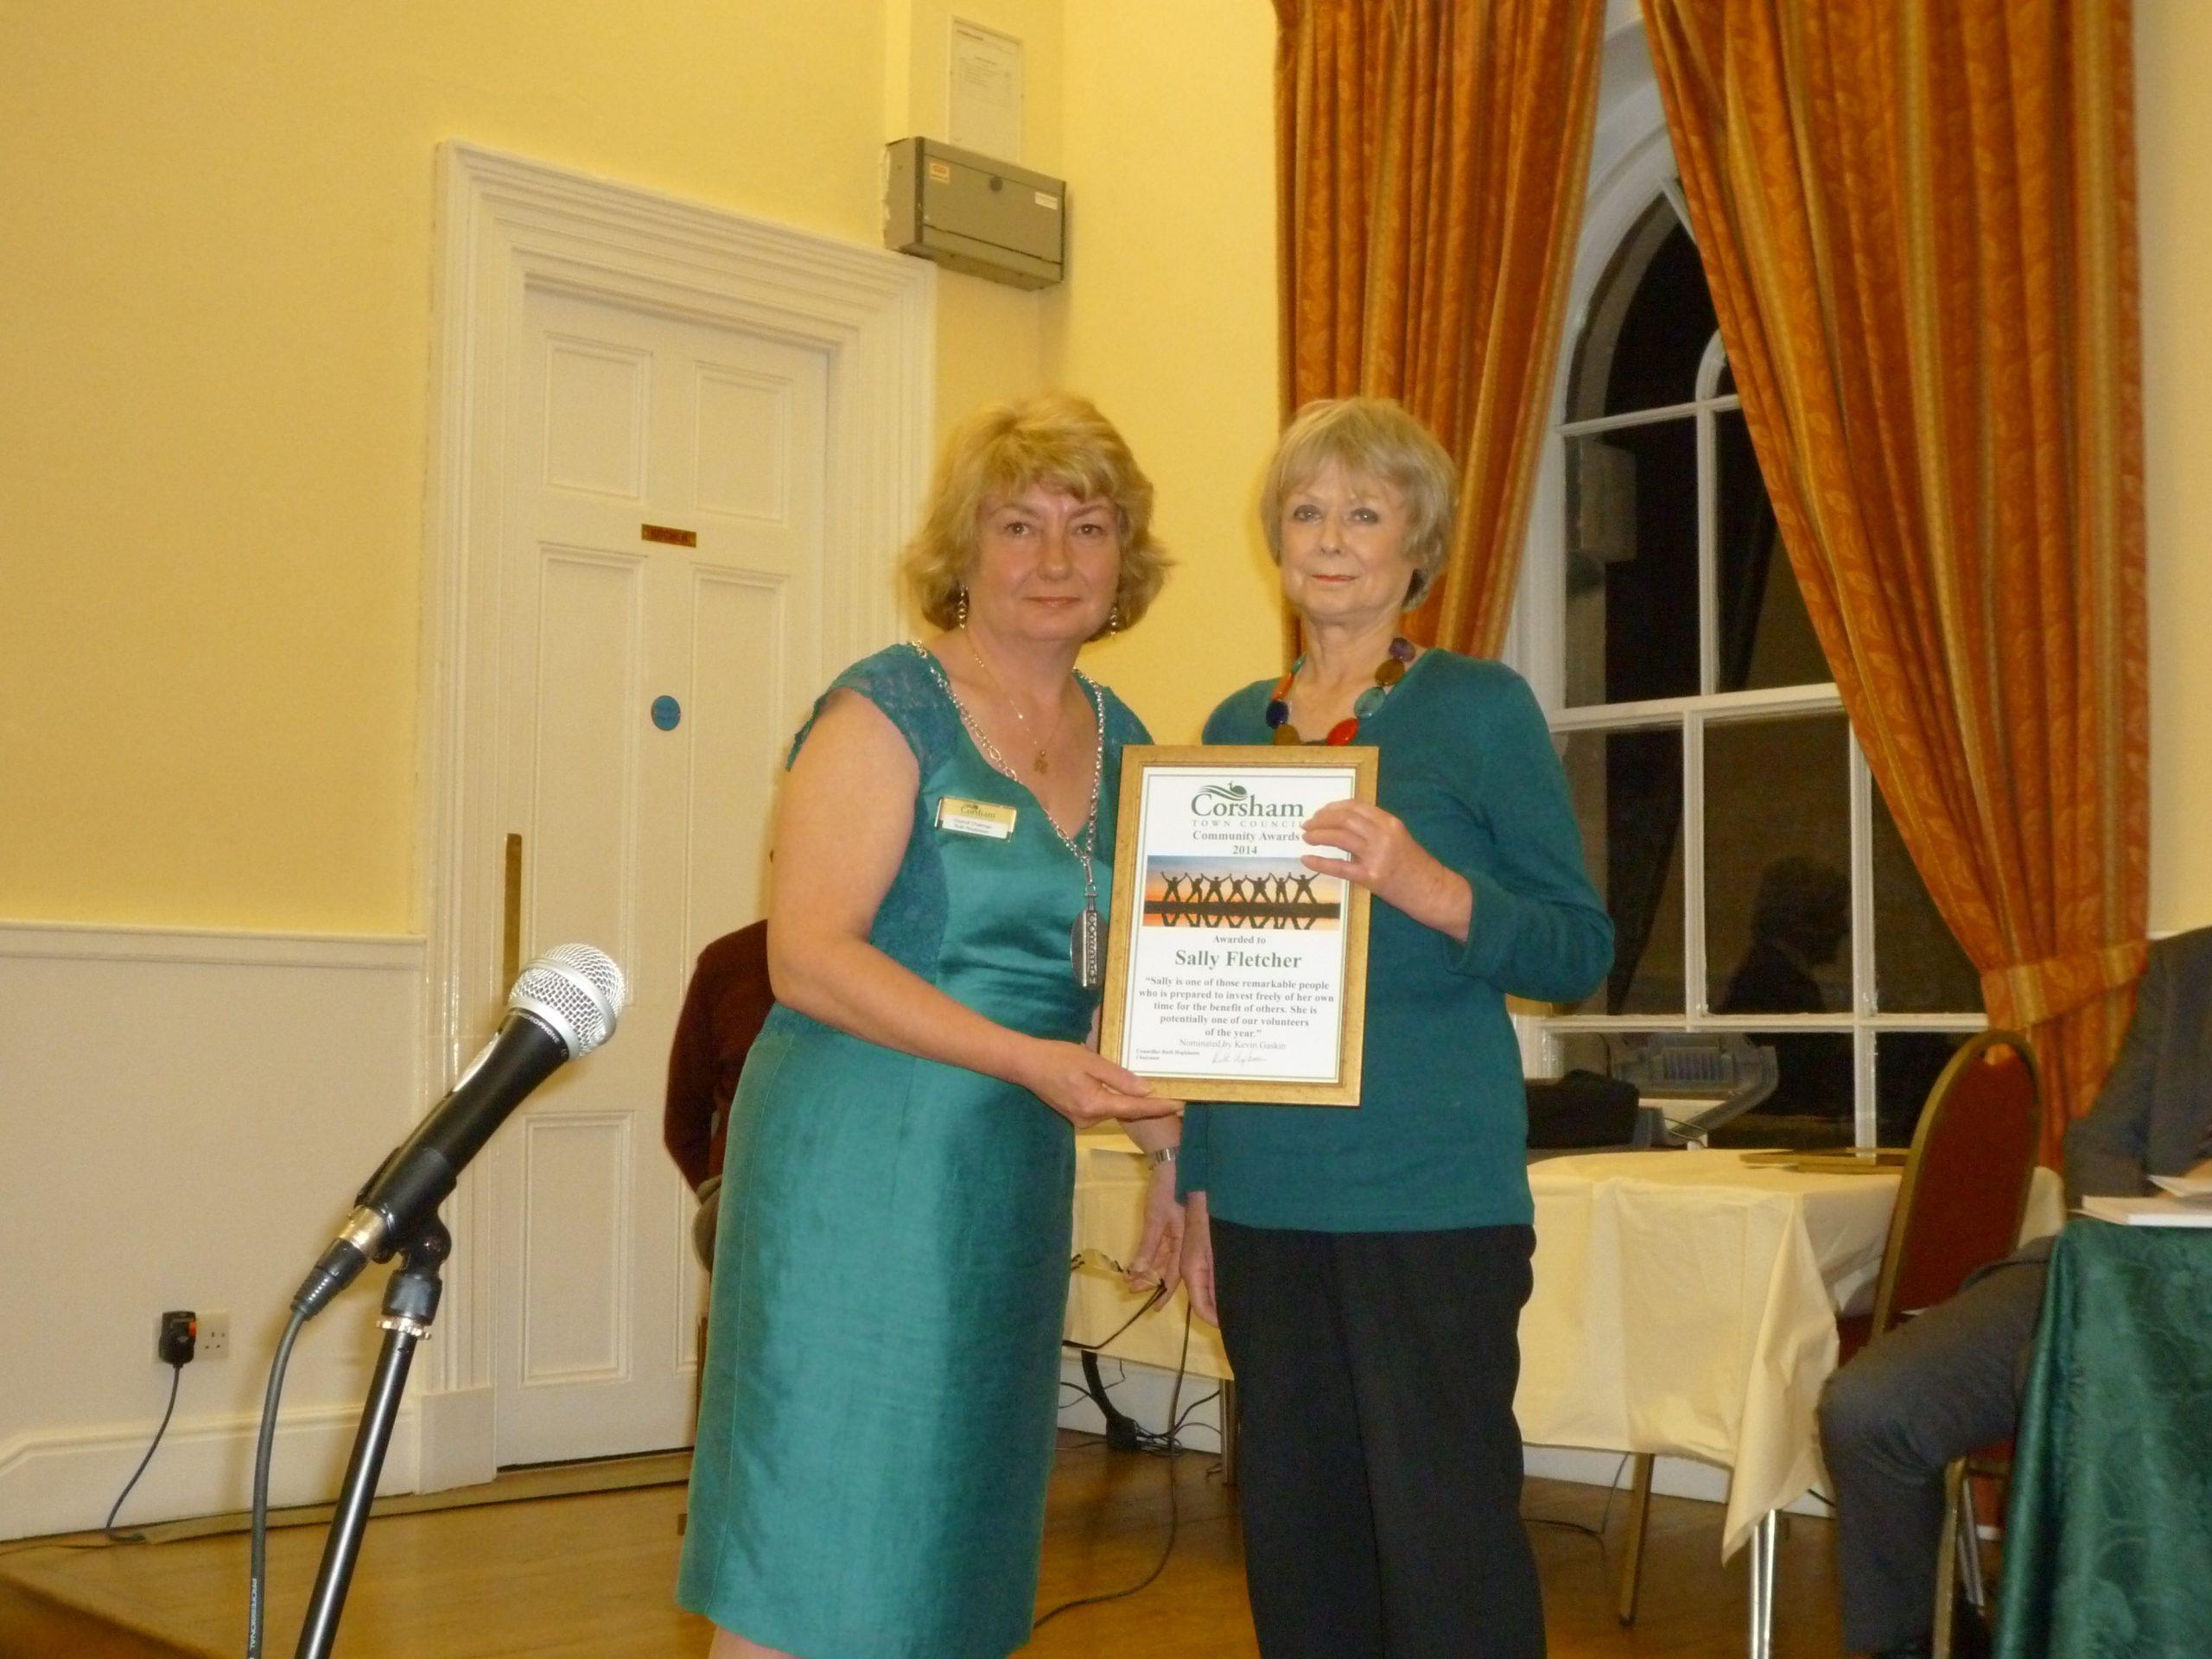 In 2014 Sally won the Corsham Community Award